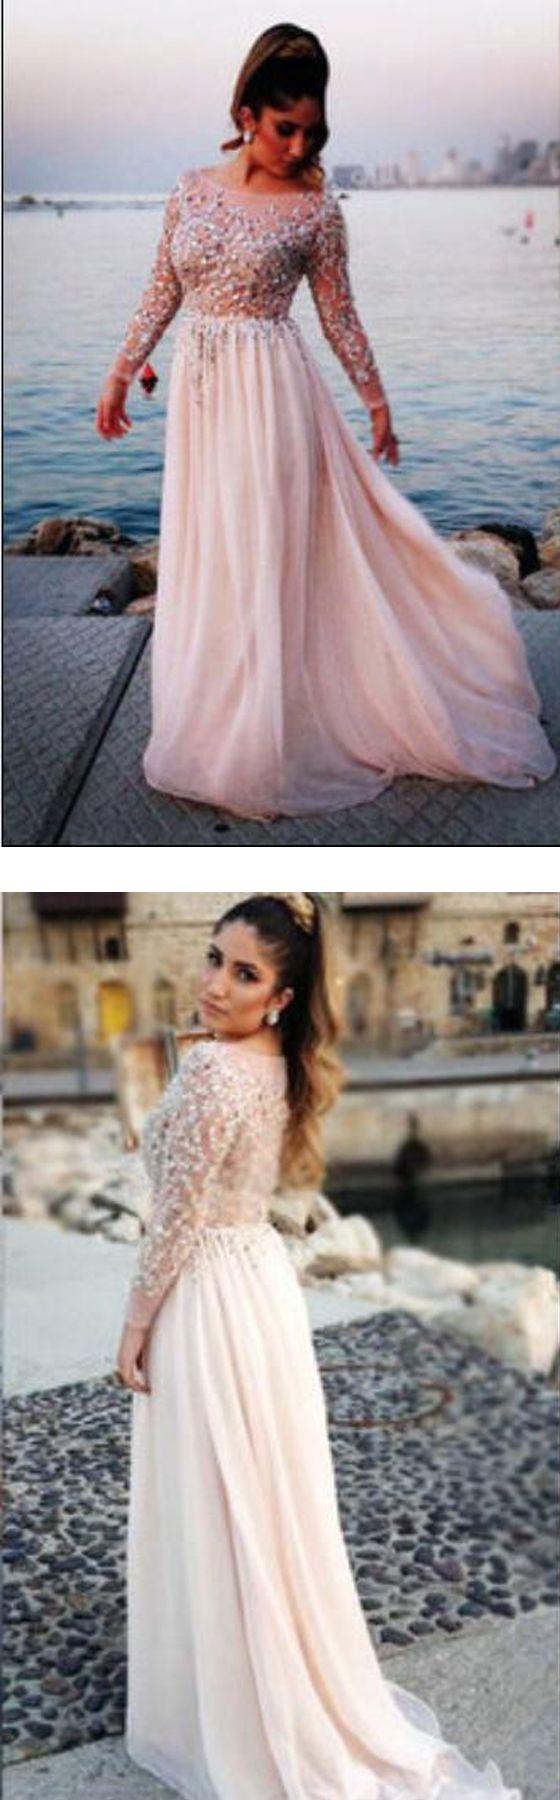 Long sleeve prom dresses, peach prom dresses, Long sleeve prom dresses, chiffon prom dresses, unique prom dresses #promdress #prom #longsleeve